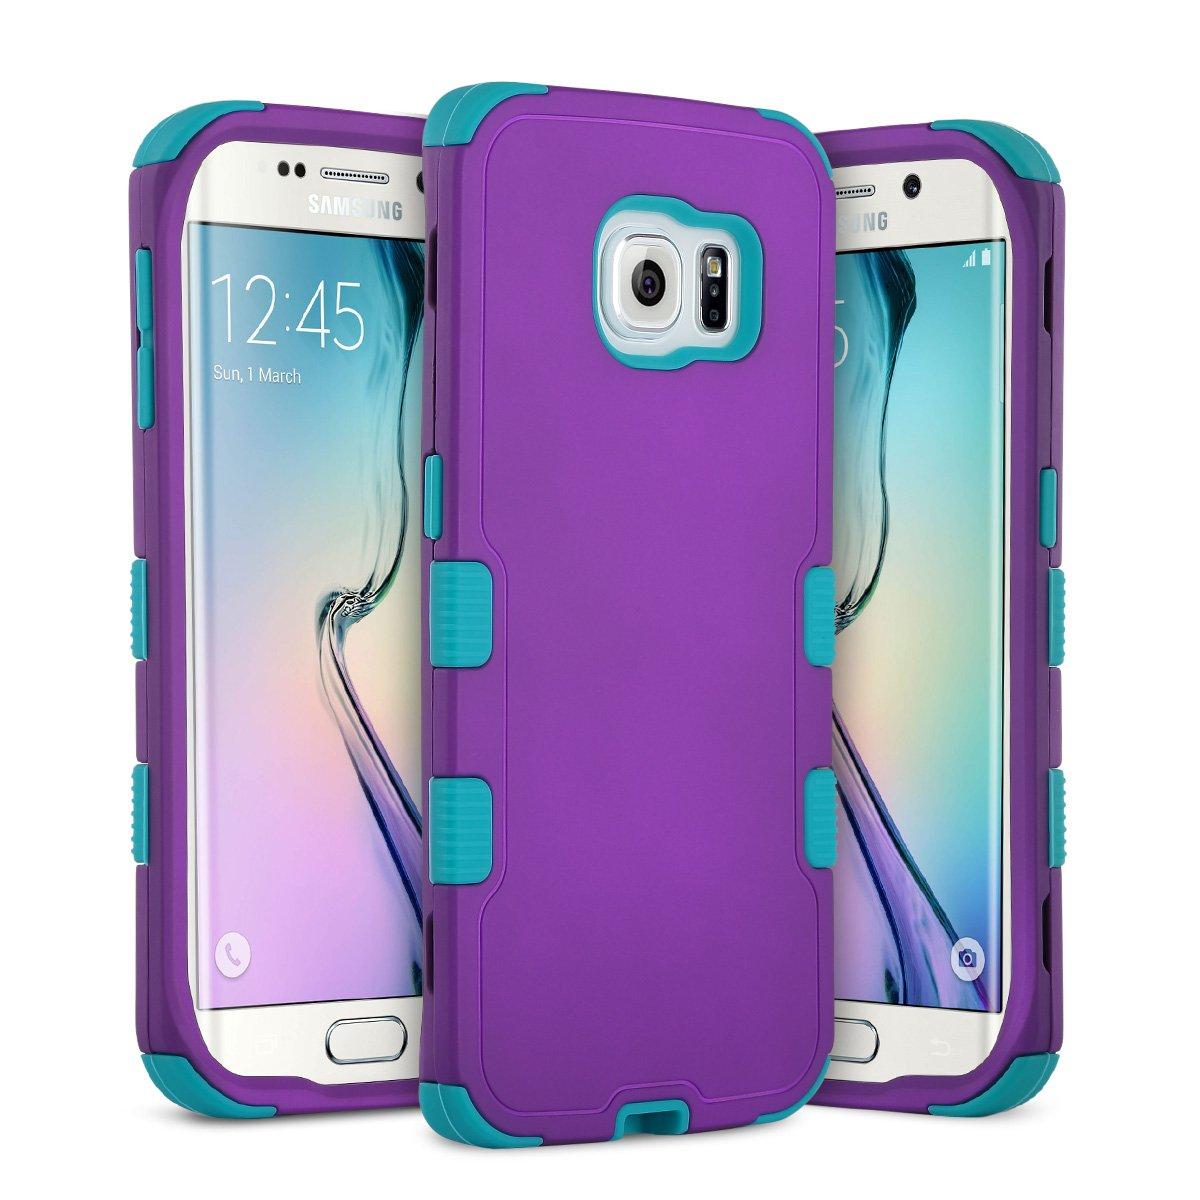 samsung galaxy s6 protective case